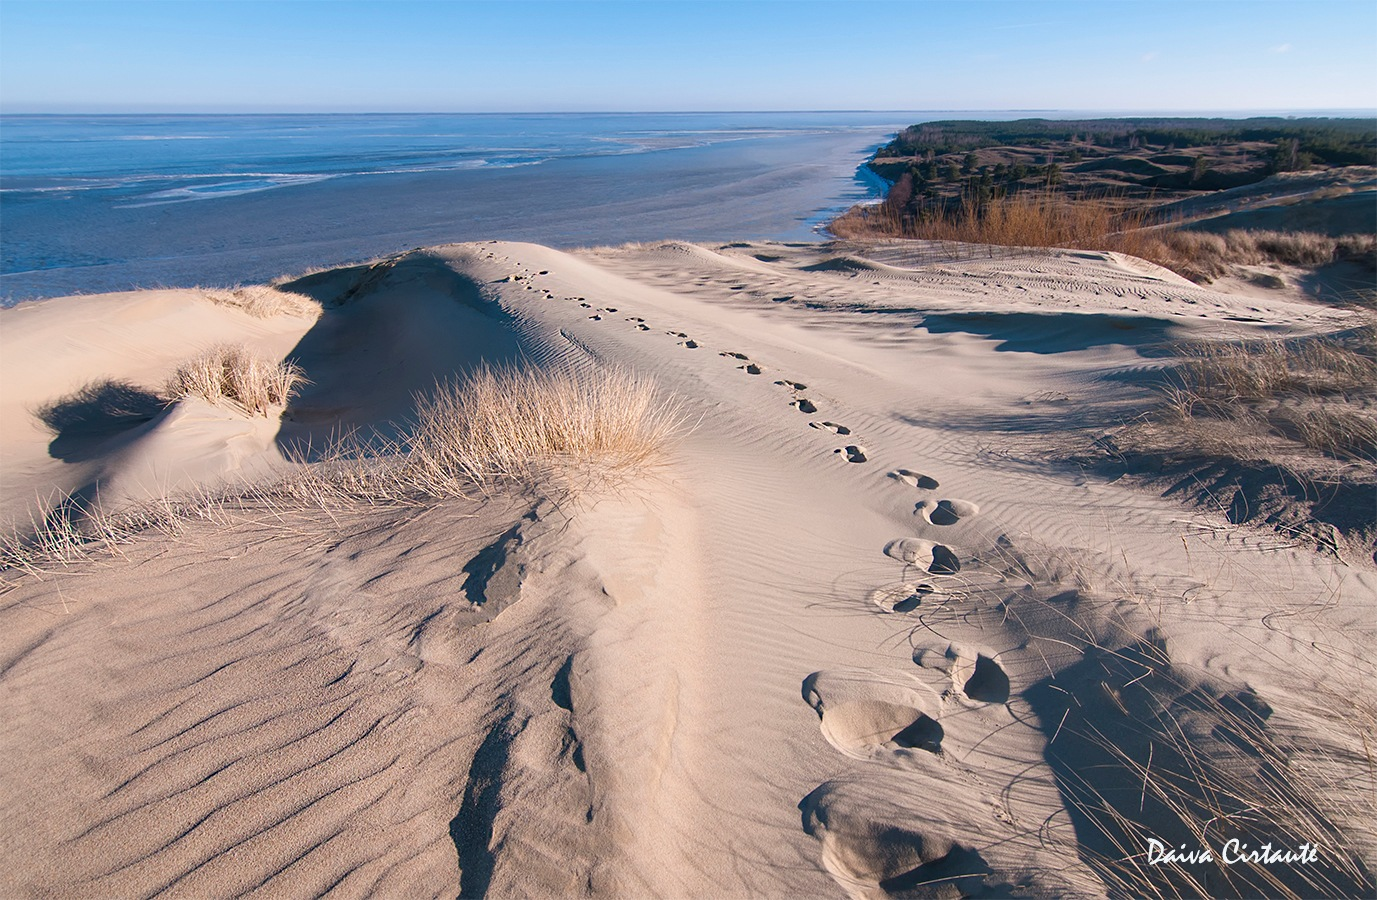 Dead dunes by Daiva Cirtautė